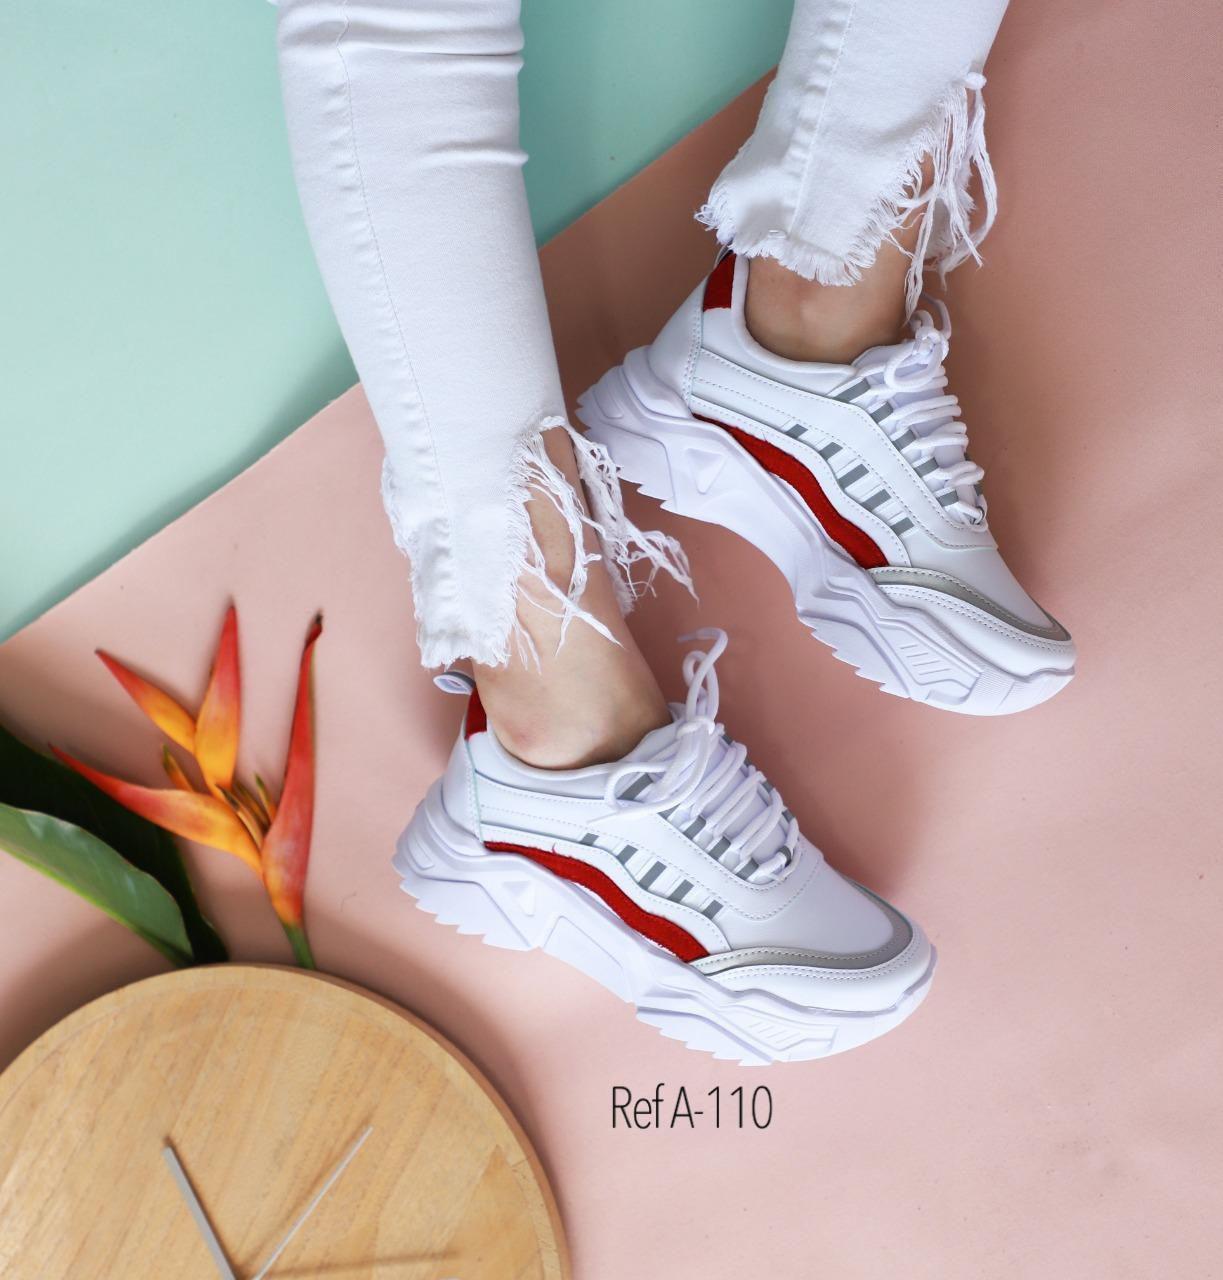 RefA-110 Blanco-Rojo